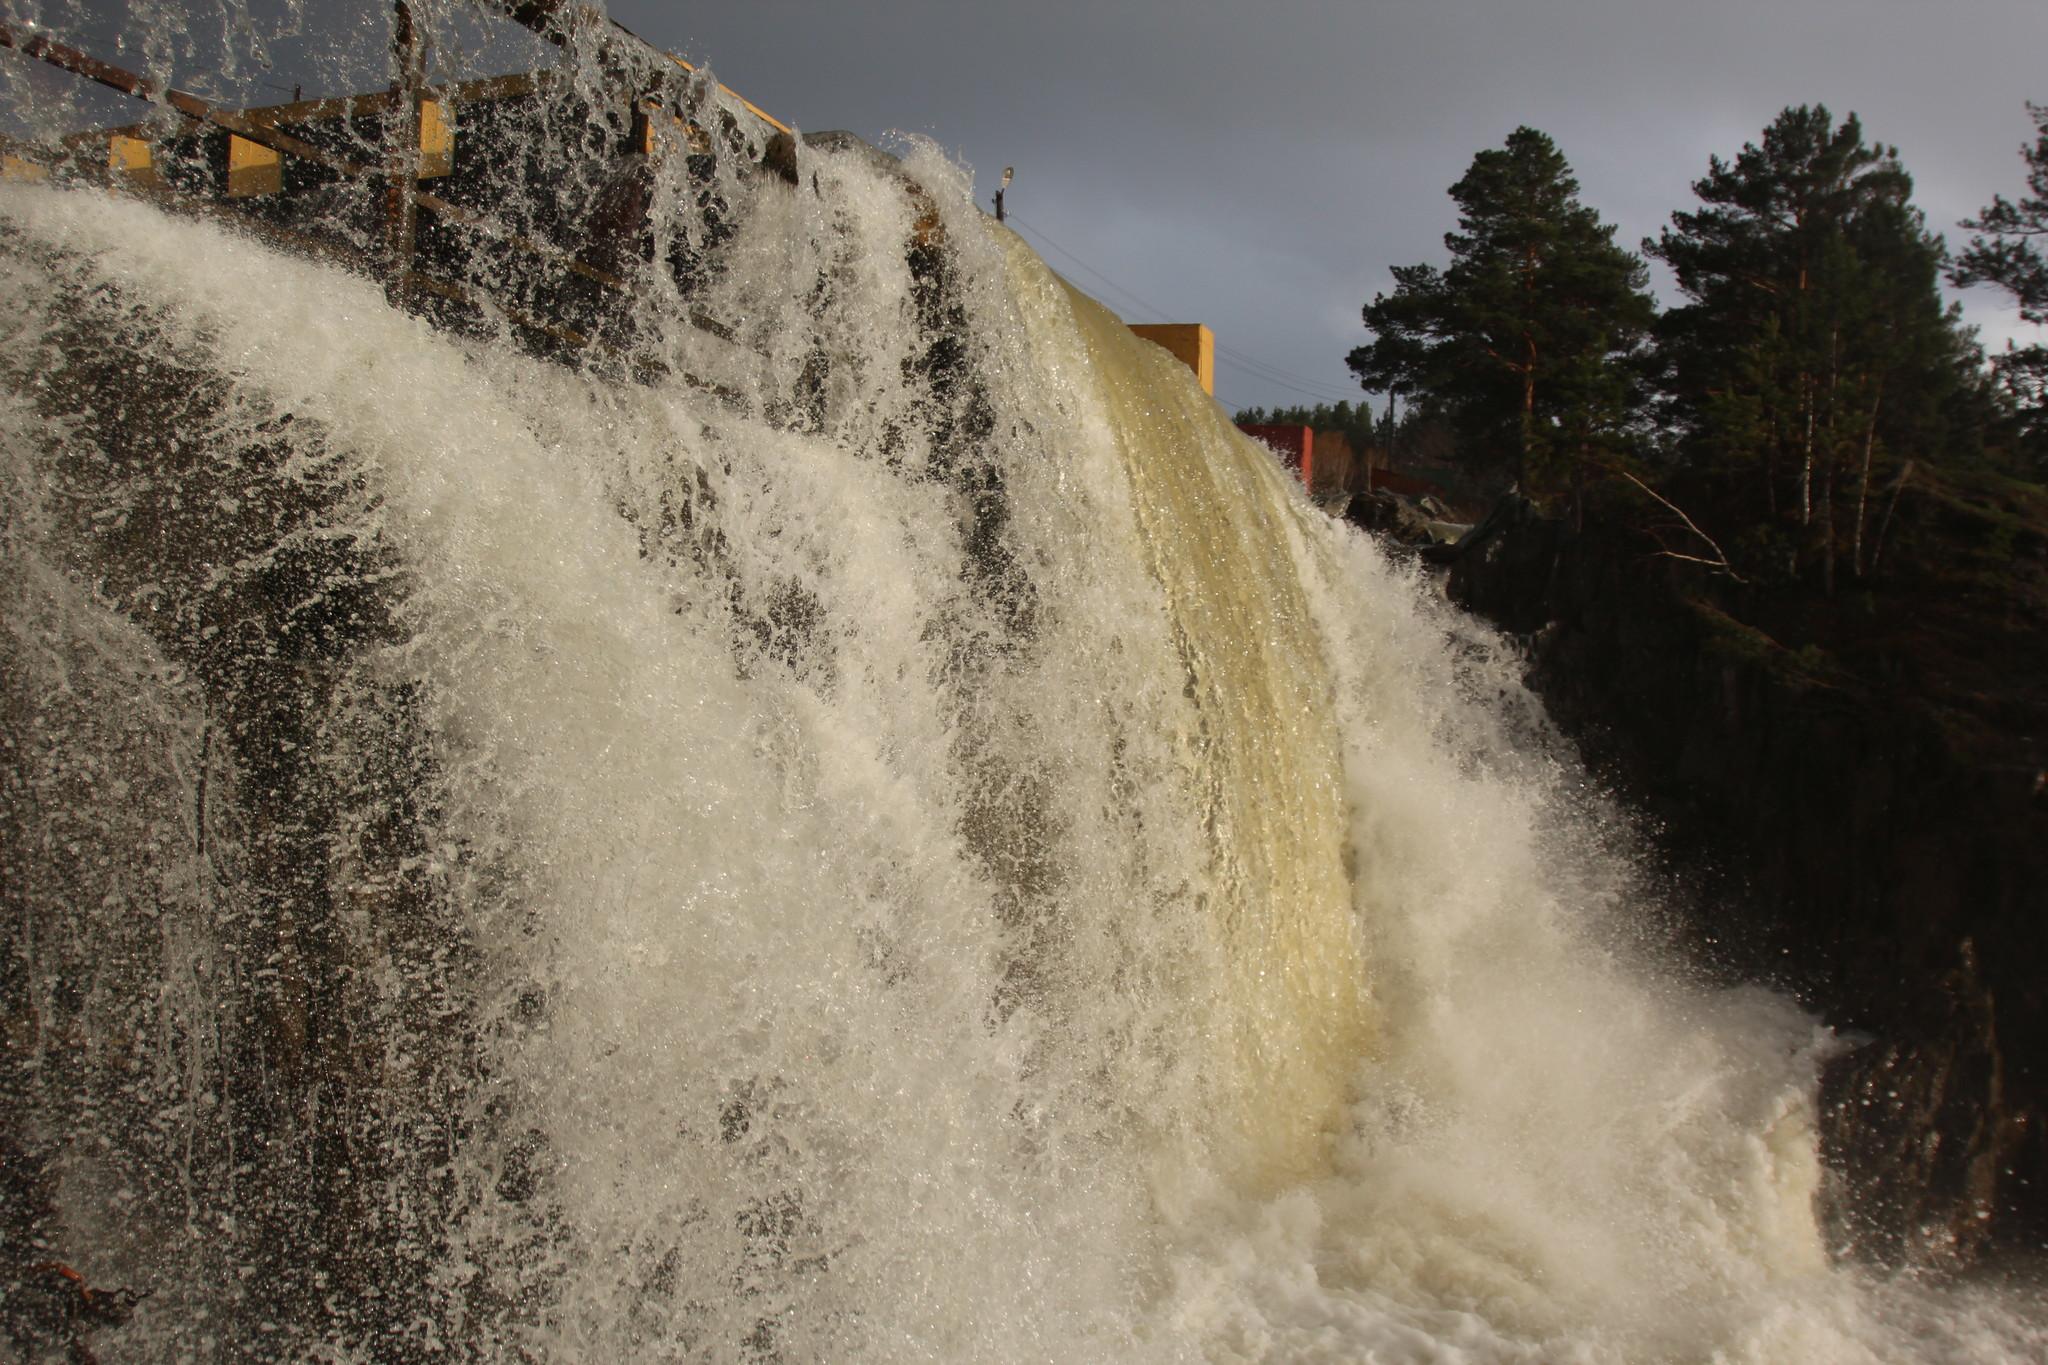 карпысак водопад фото зимой семейное видео